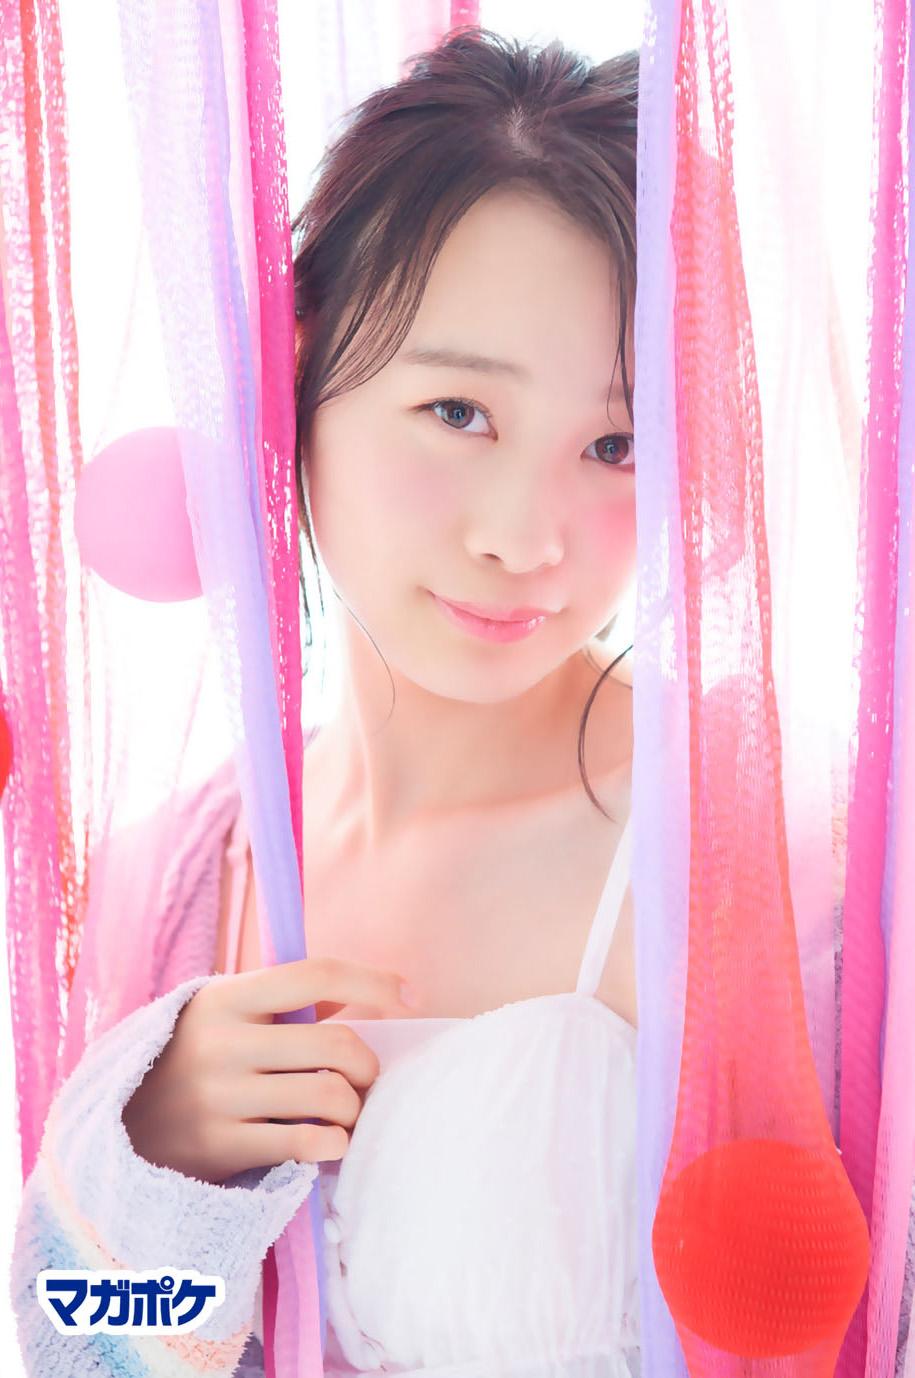 Yokoyama Yui 横山結衣, AKB48 Team8 x Weekly Maga Cover Competition